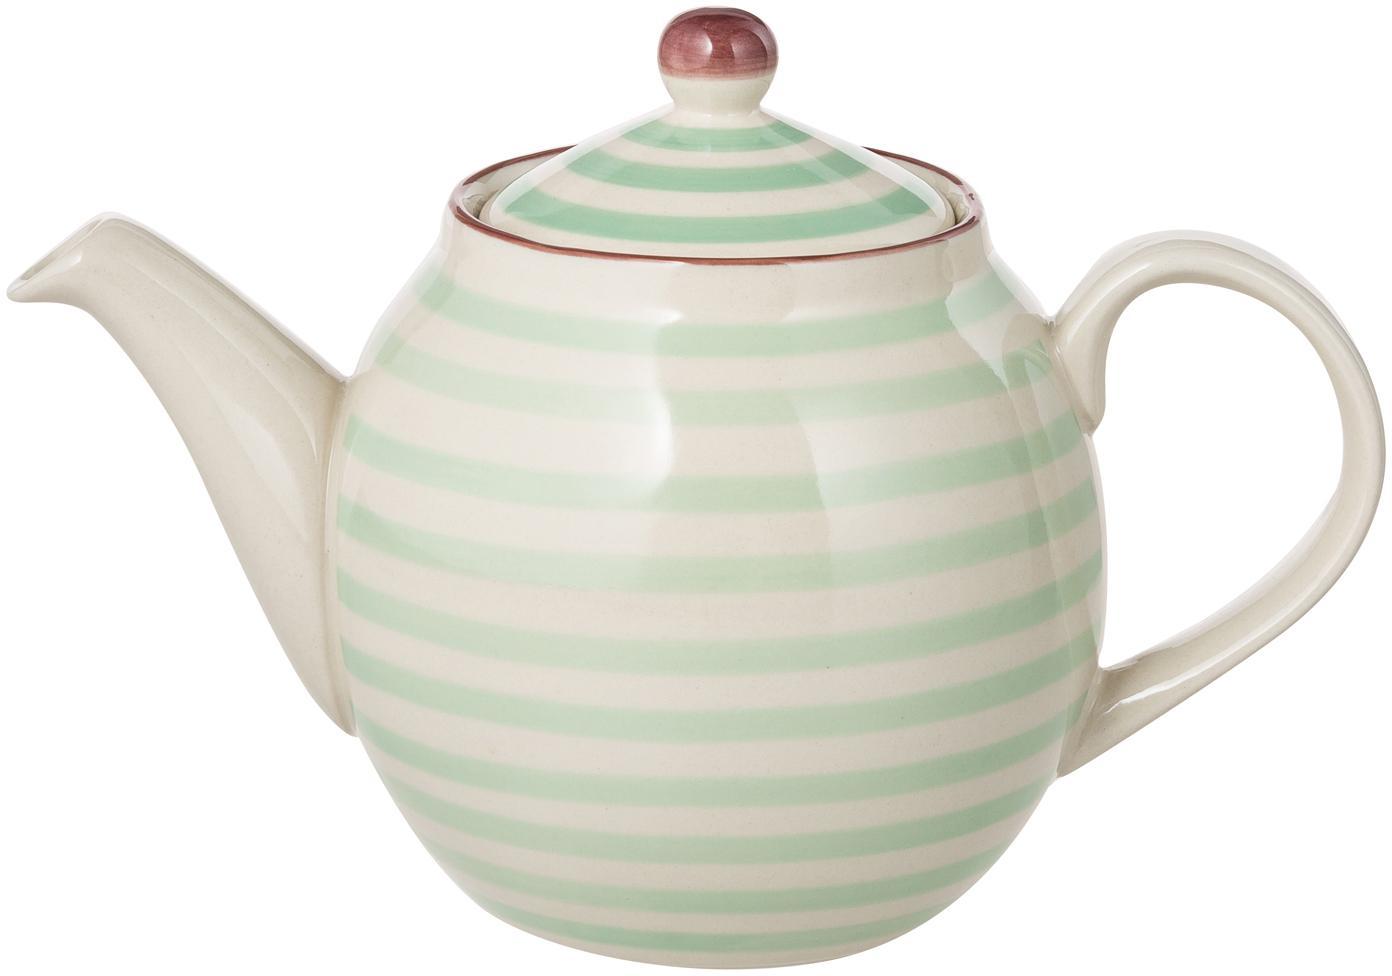 Tetera artesanal Patrizia, Gres, Verde, crema, violeta, 1.2 L